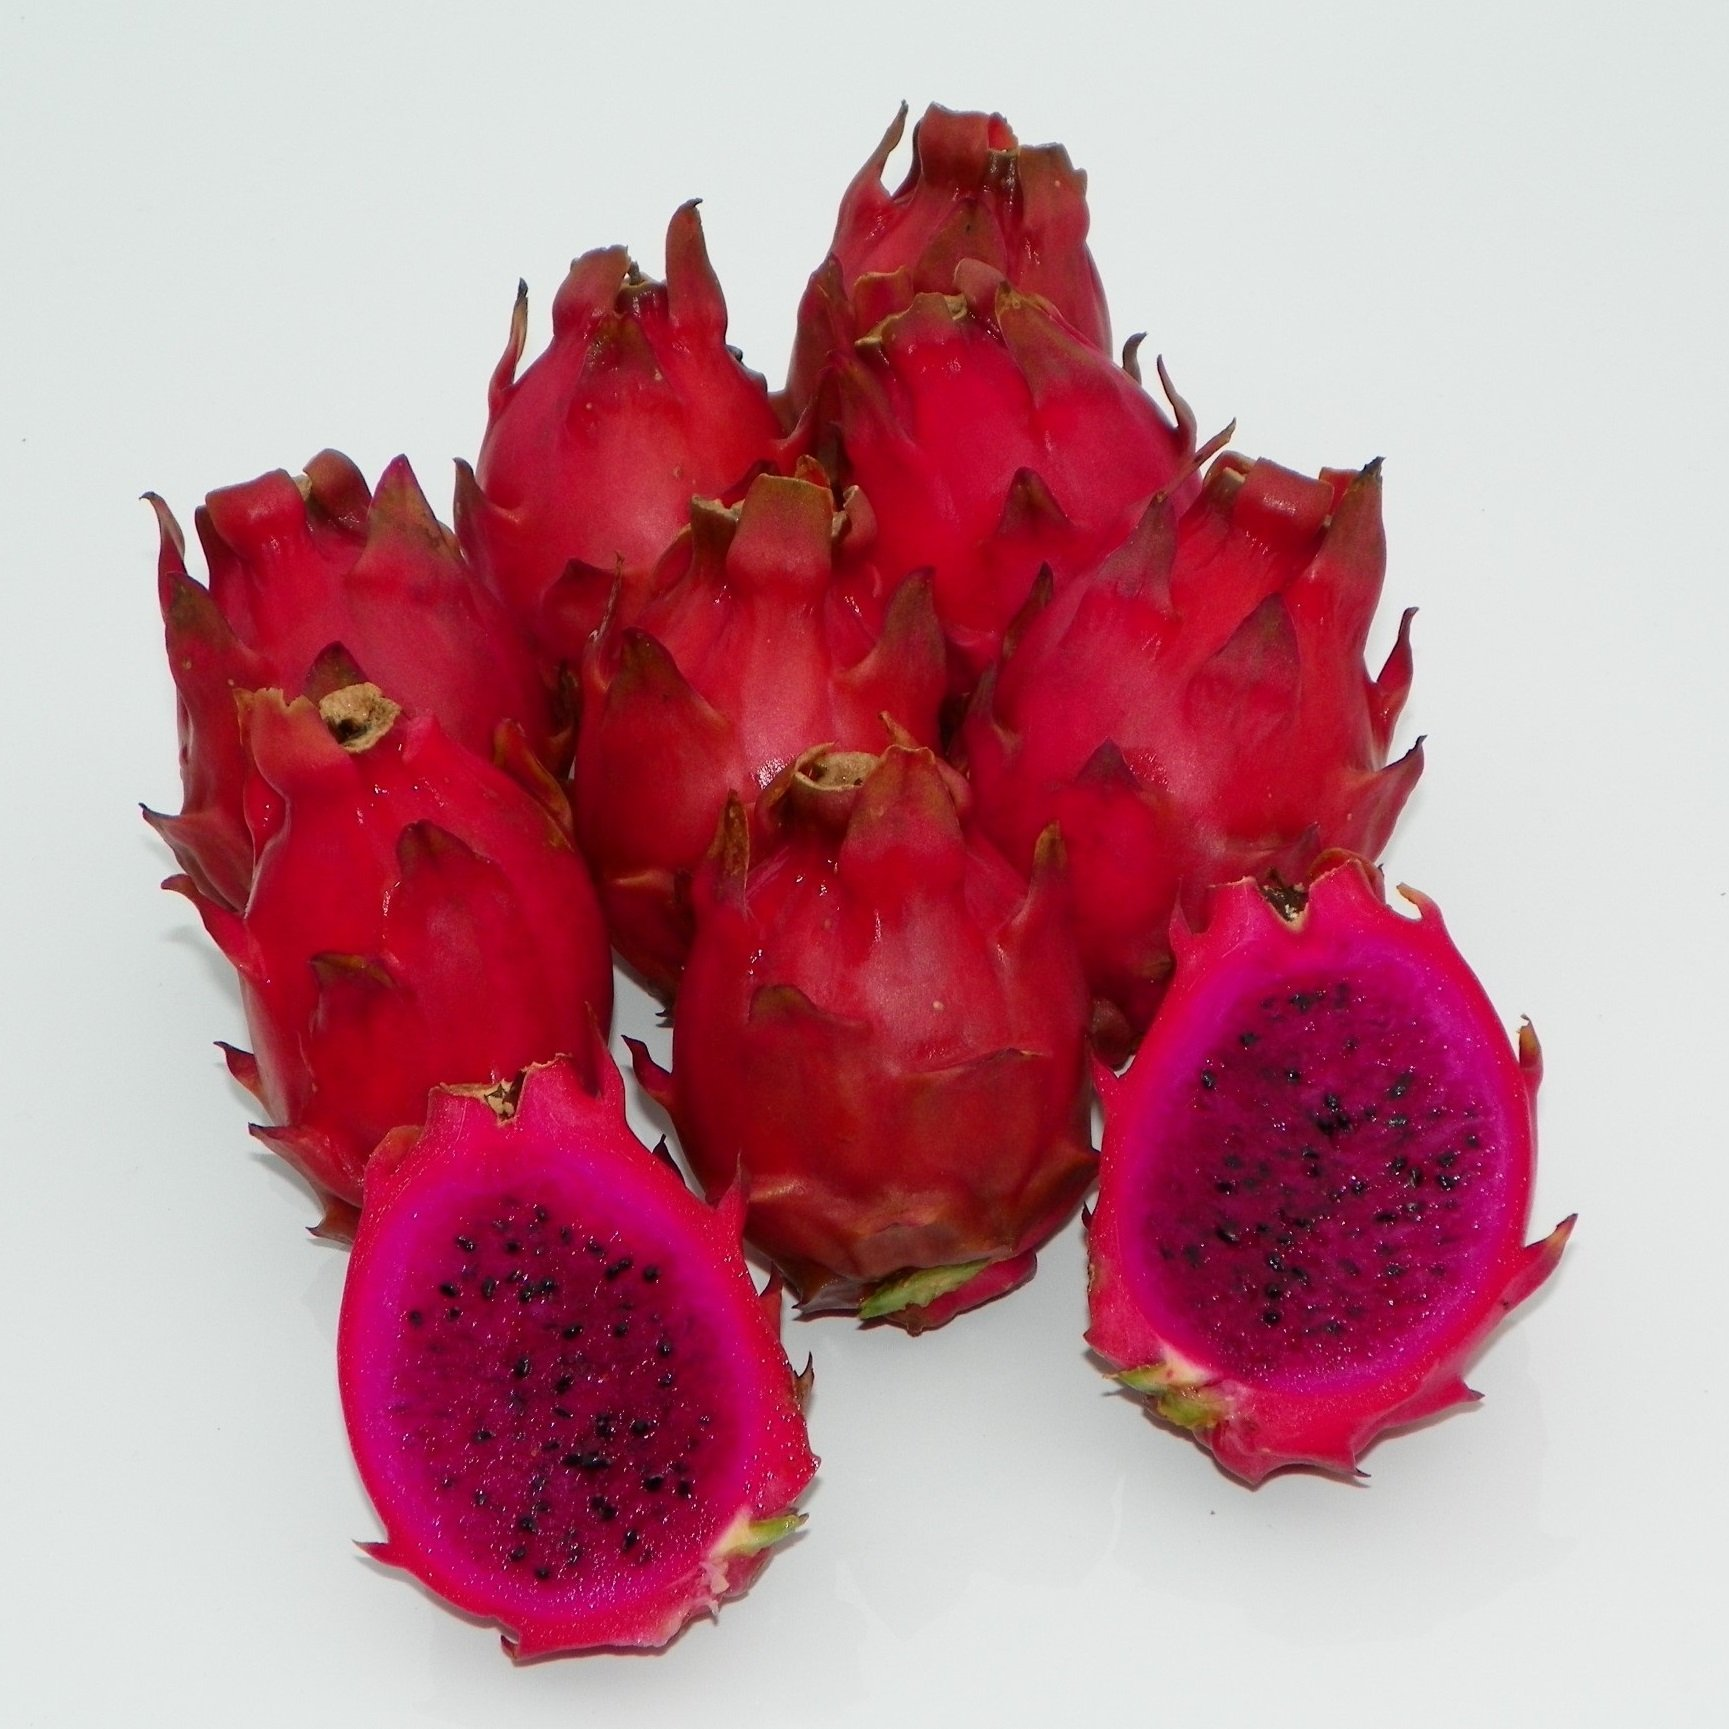 Dragon Fruit variety Voodoo Child fruit sliced